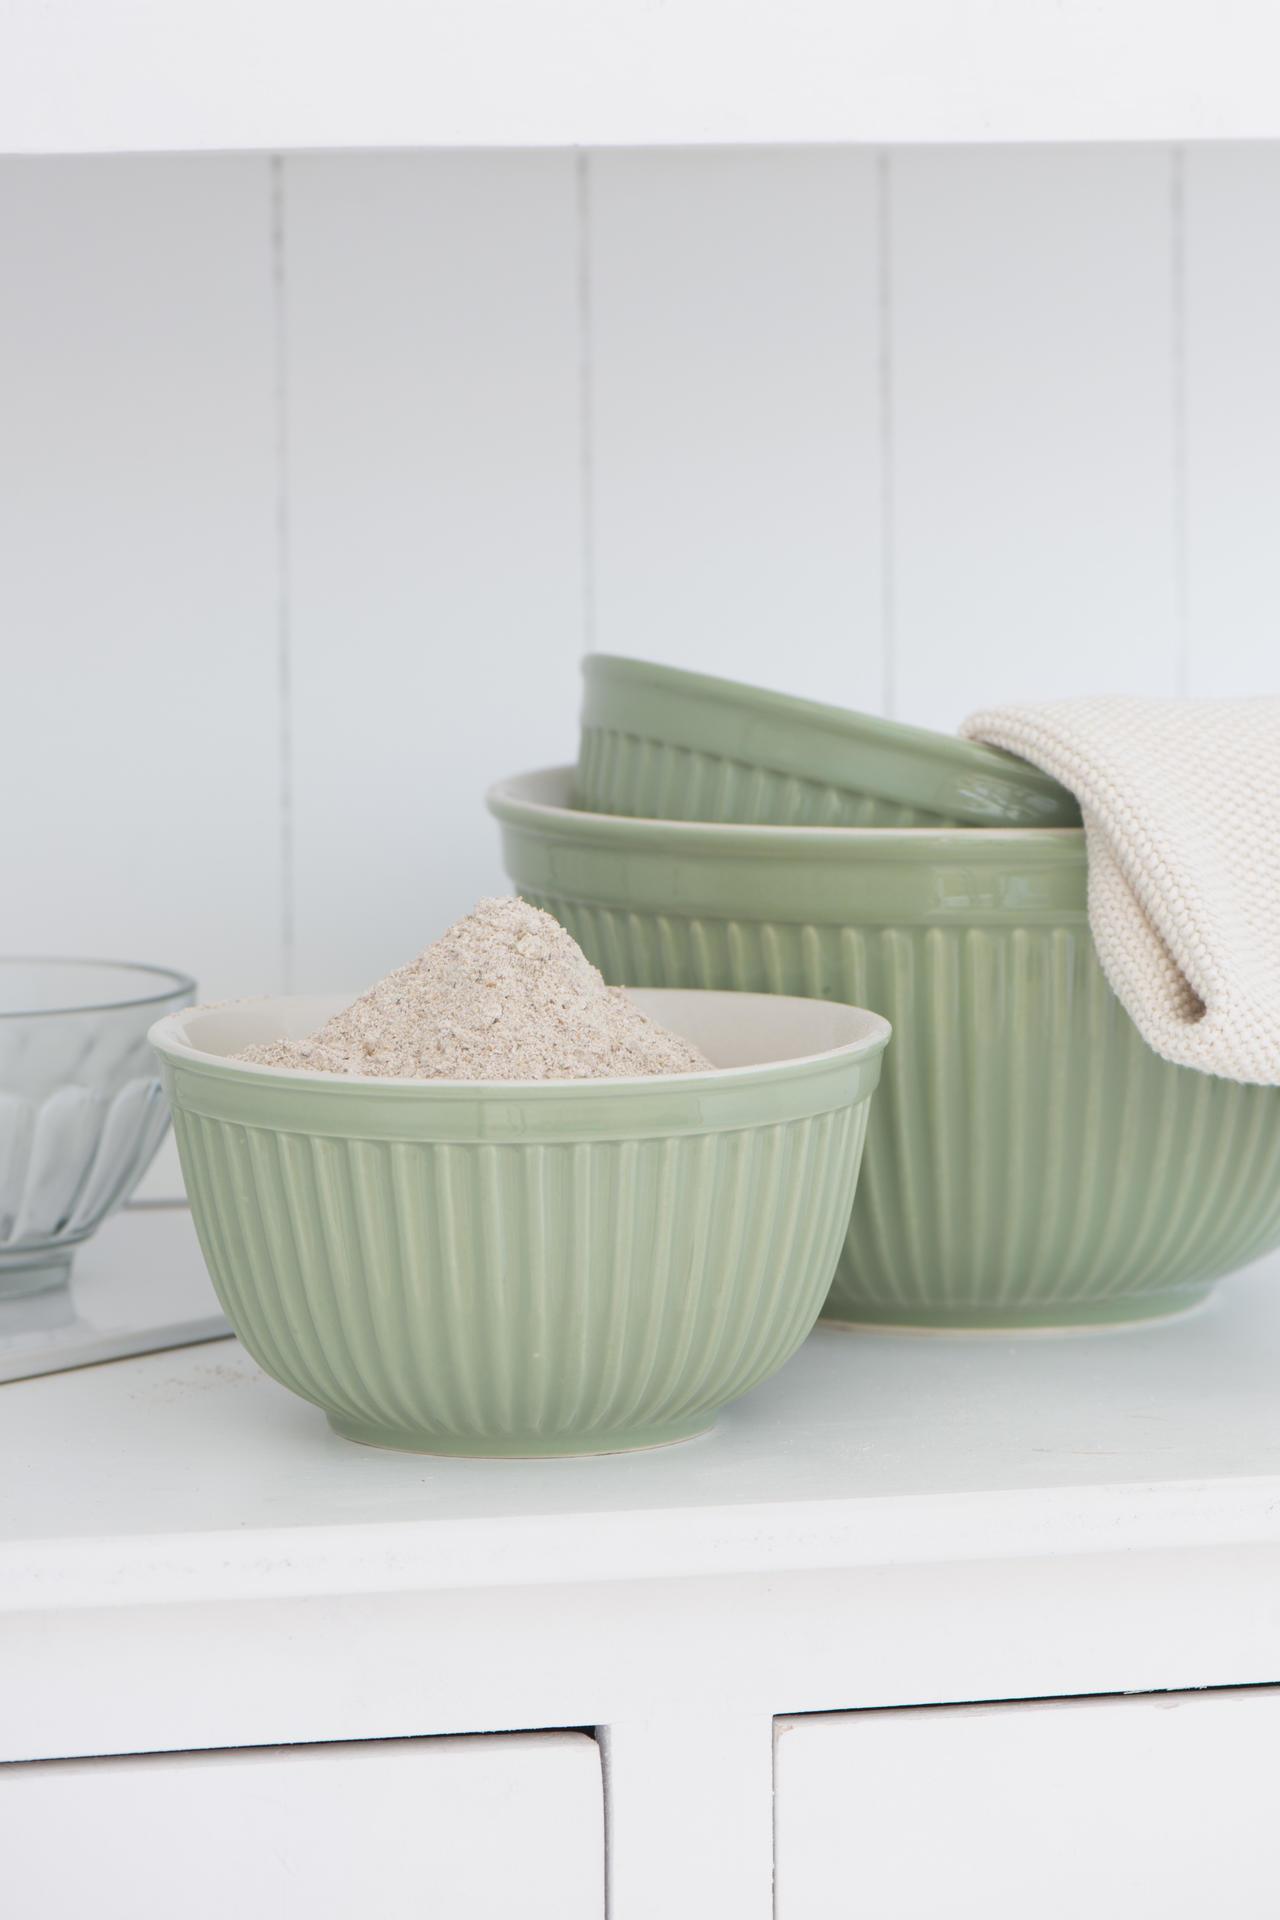 IB LAURSEN Keramická mísa Mynte Meadow green Velikost S, zelená barva, keramika